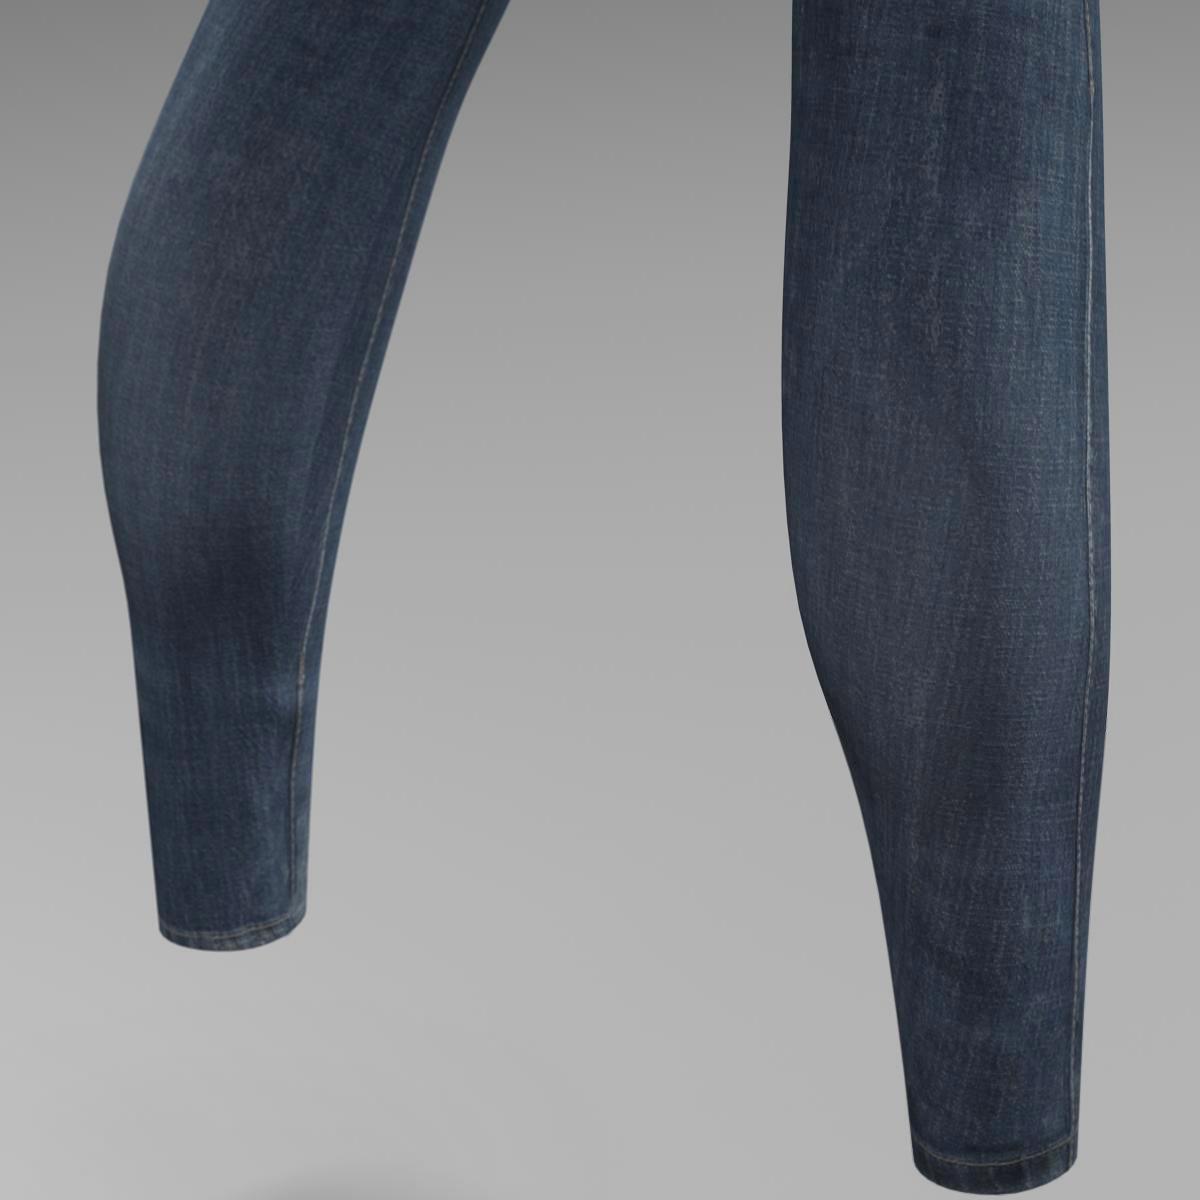 female jeans 3d model 3ds max fbx c4d ma mb obj 160407